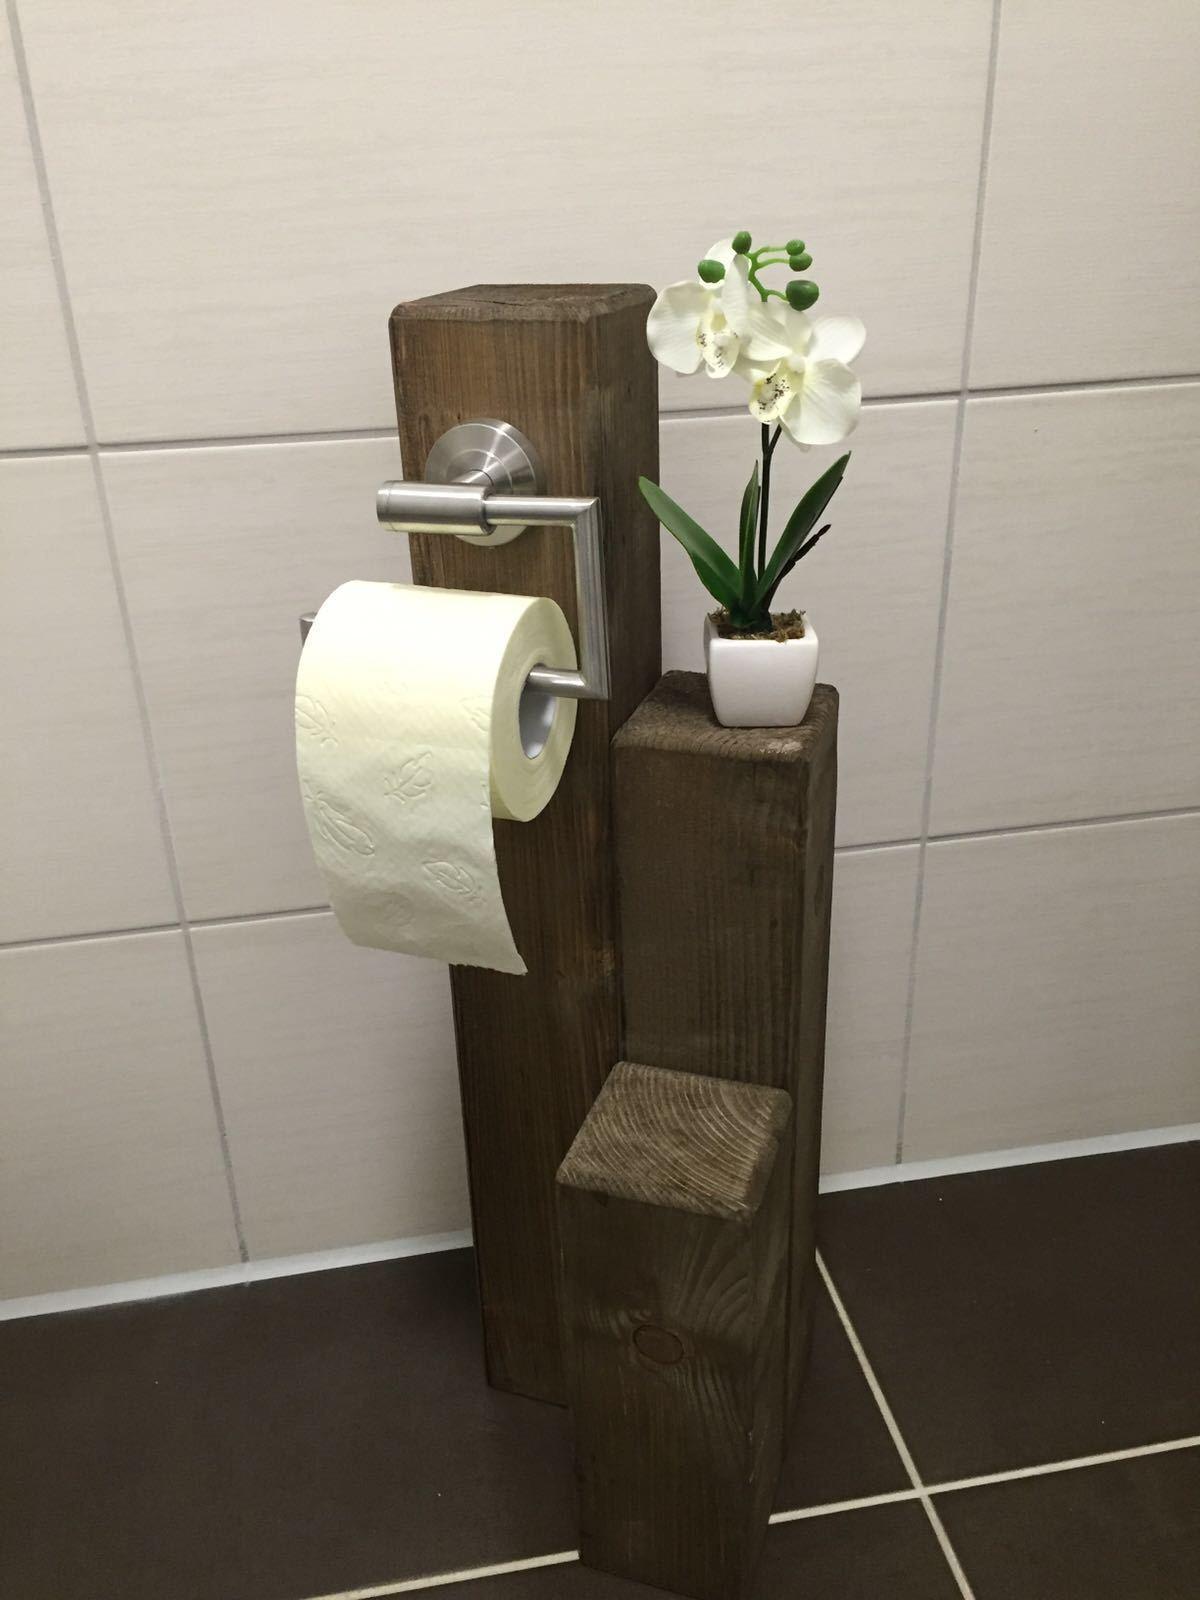 wc rollenhalter toilettenpapierhalter klorollenhalter rustikal wc rolle vintage eur 45 00. Black Bedroom Furniture Sets. Home Design Ideas